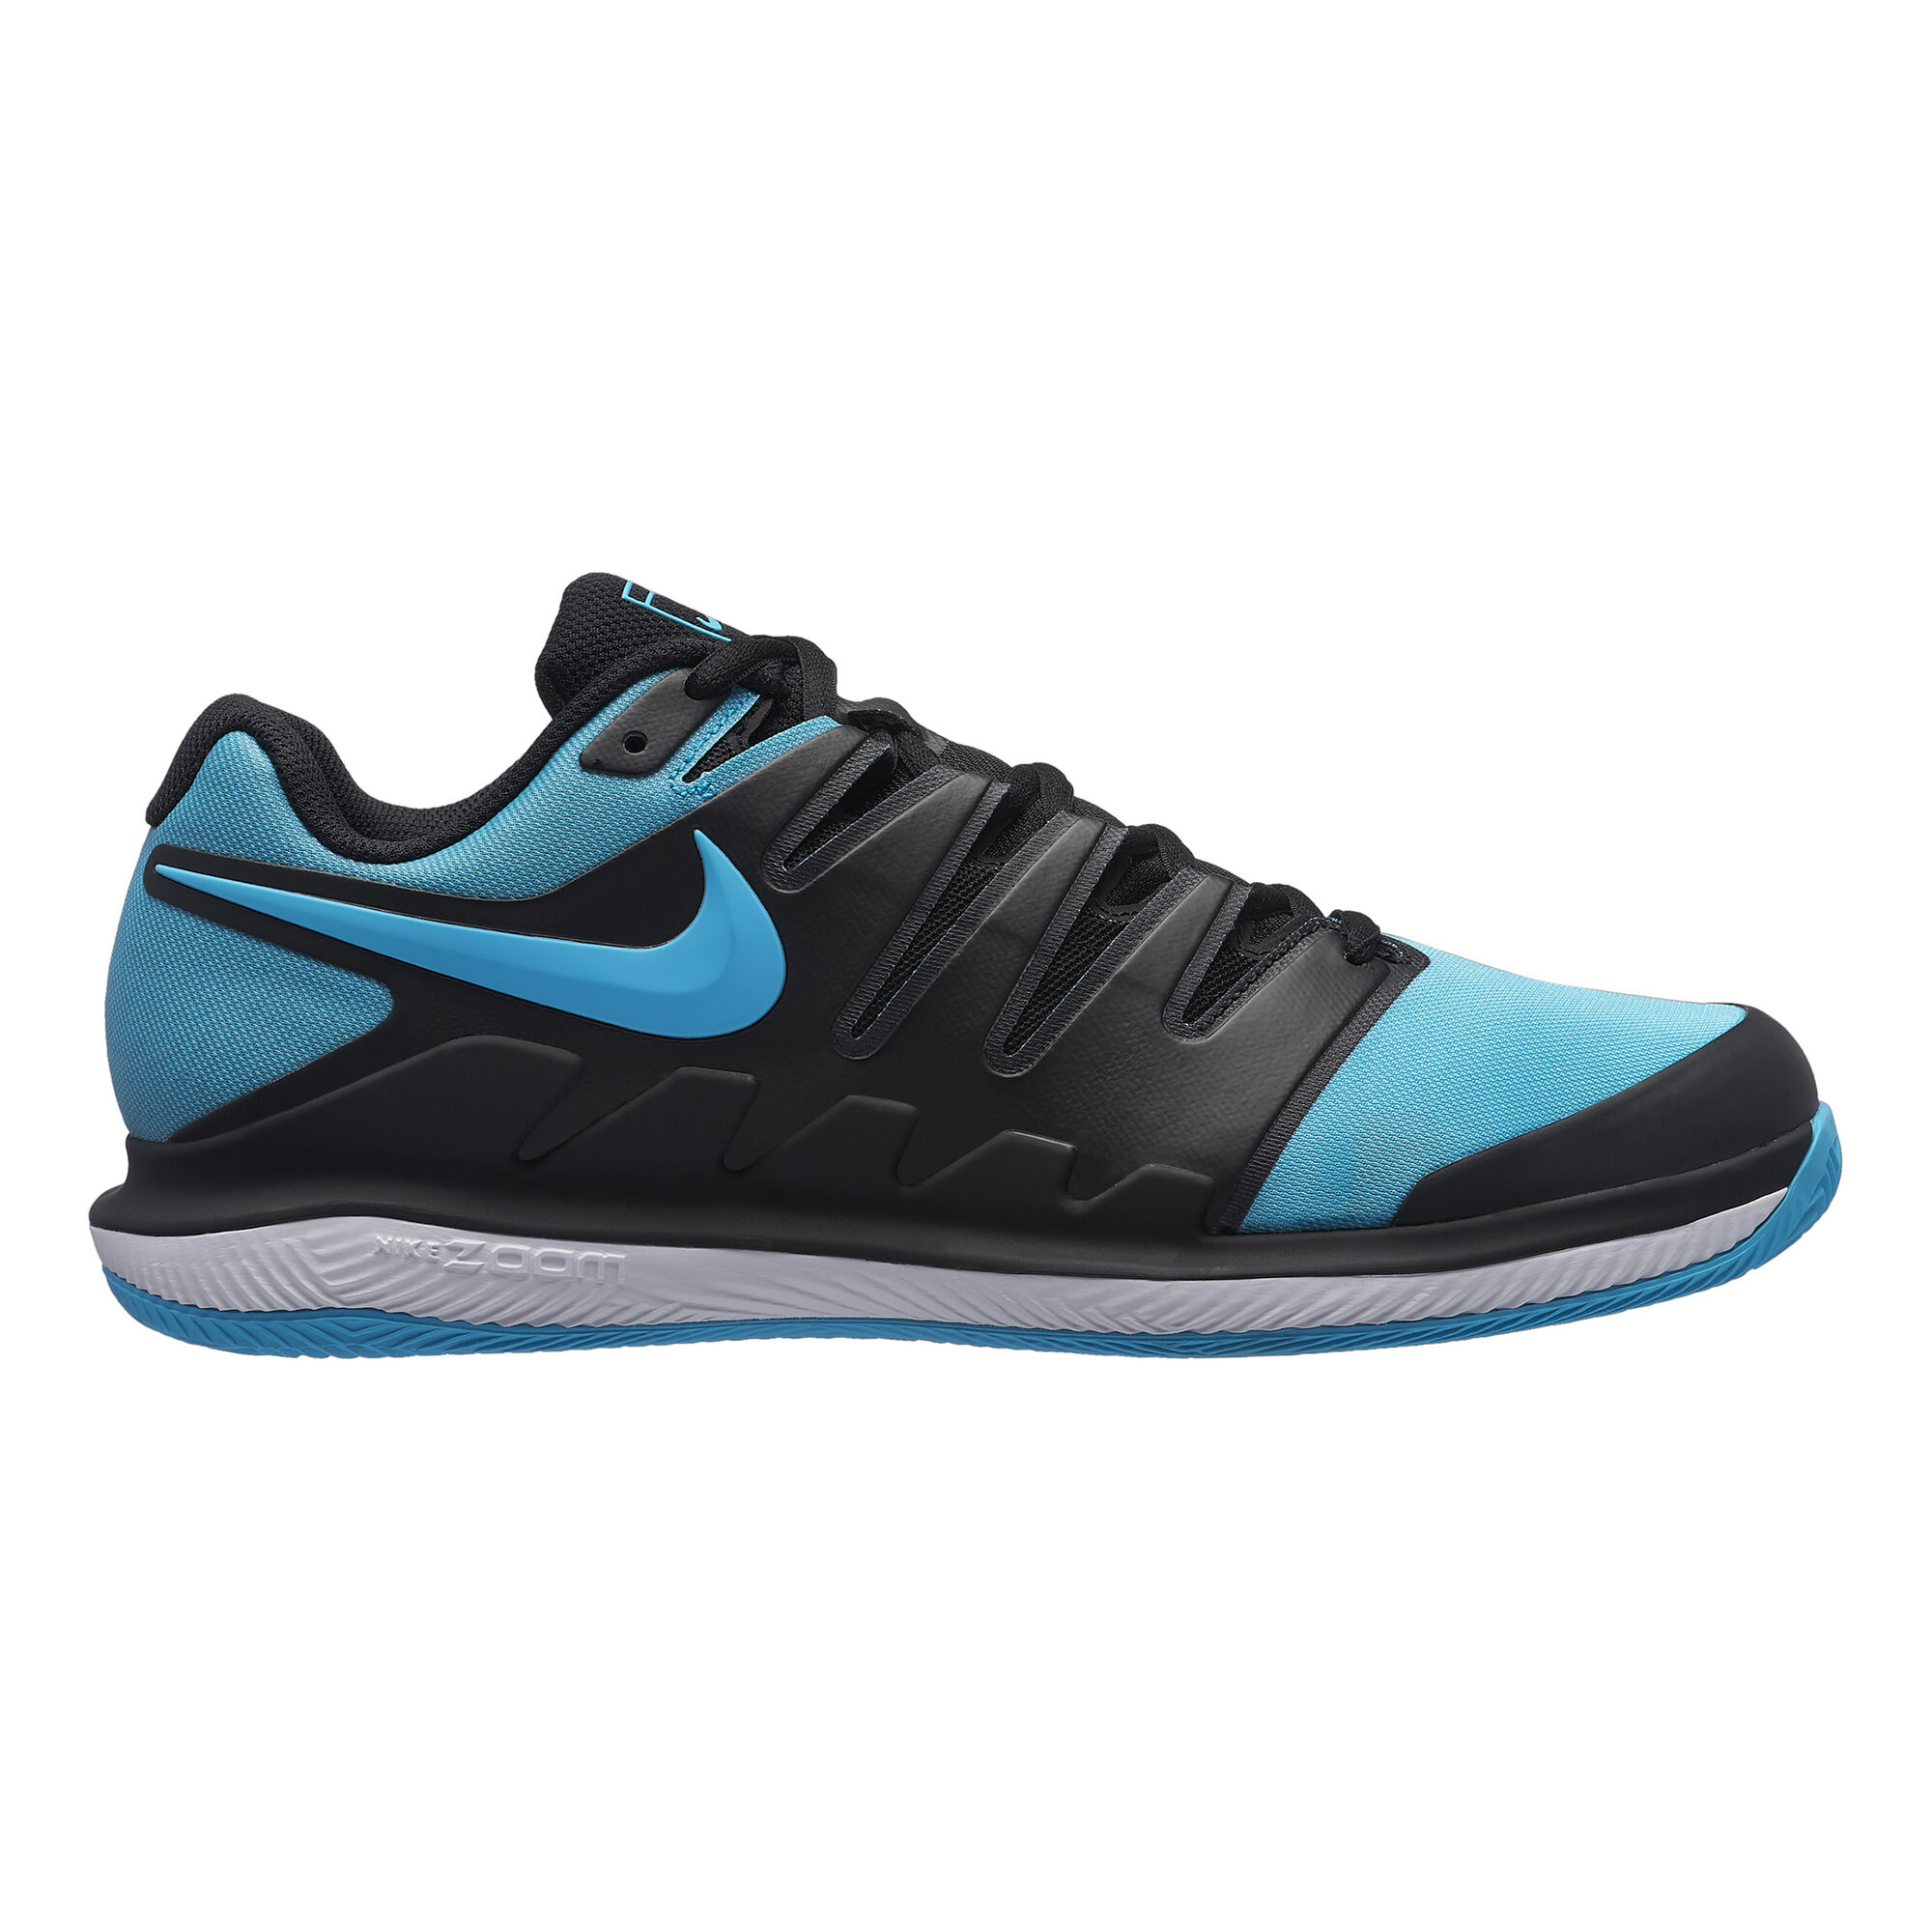 separation shoes 26ecd 6b2f3 Nike  Nike  Nike  Nike  Nike. Air Zoom Vapor X Clay ...